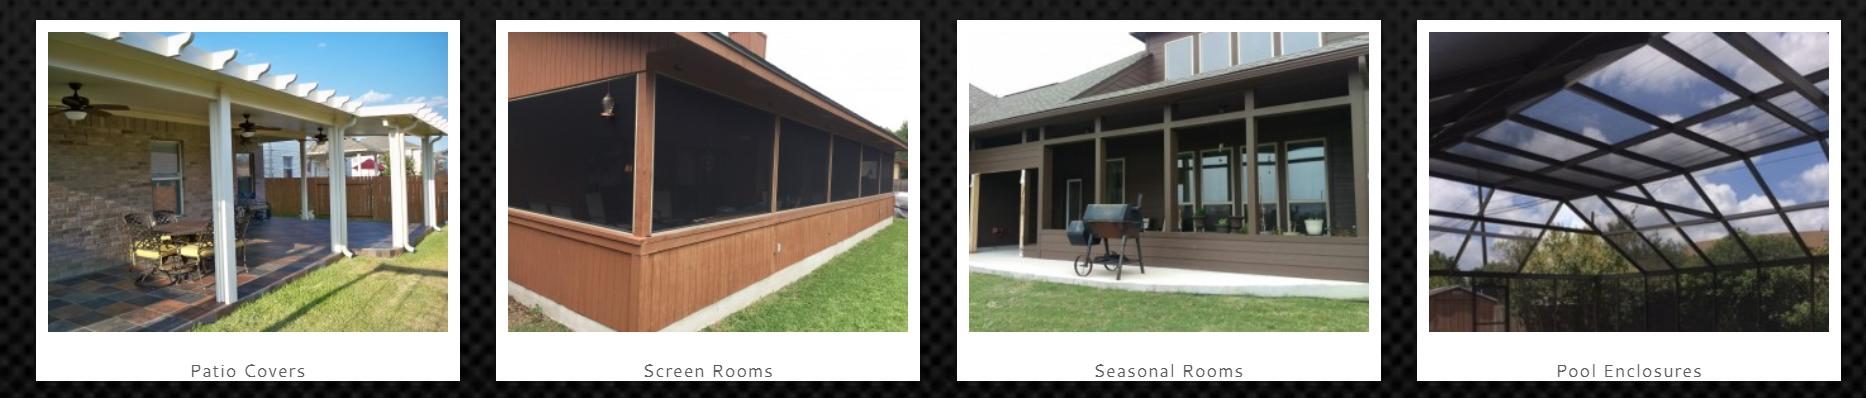 Oasis Patio Enclosures, LLC image 0